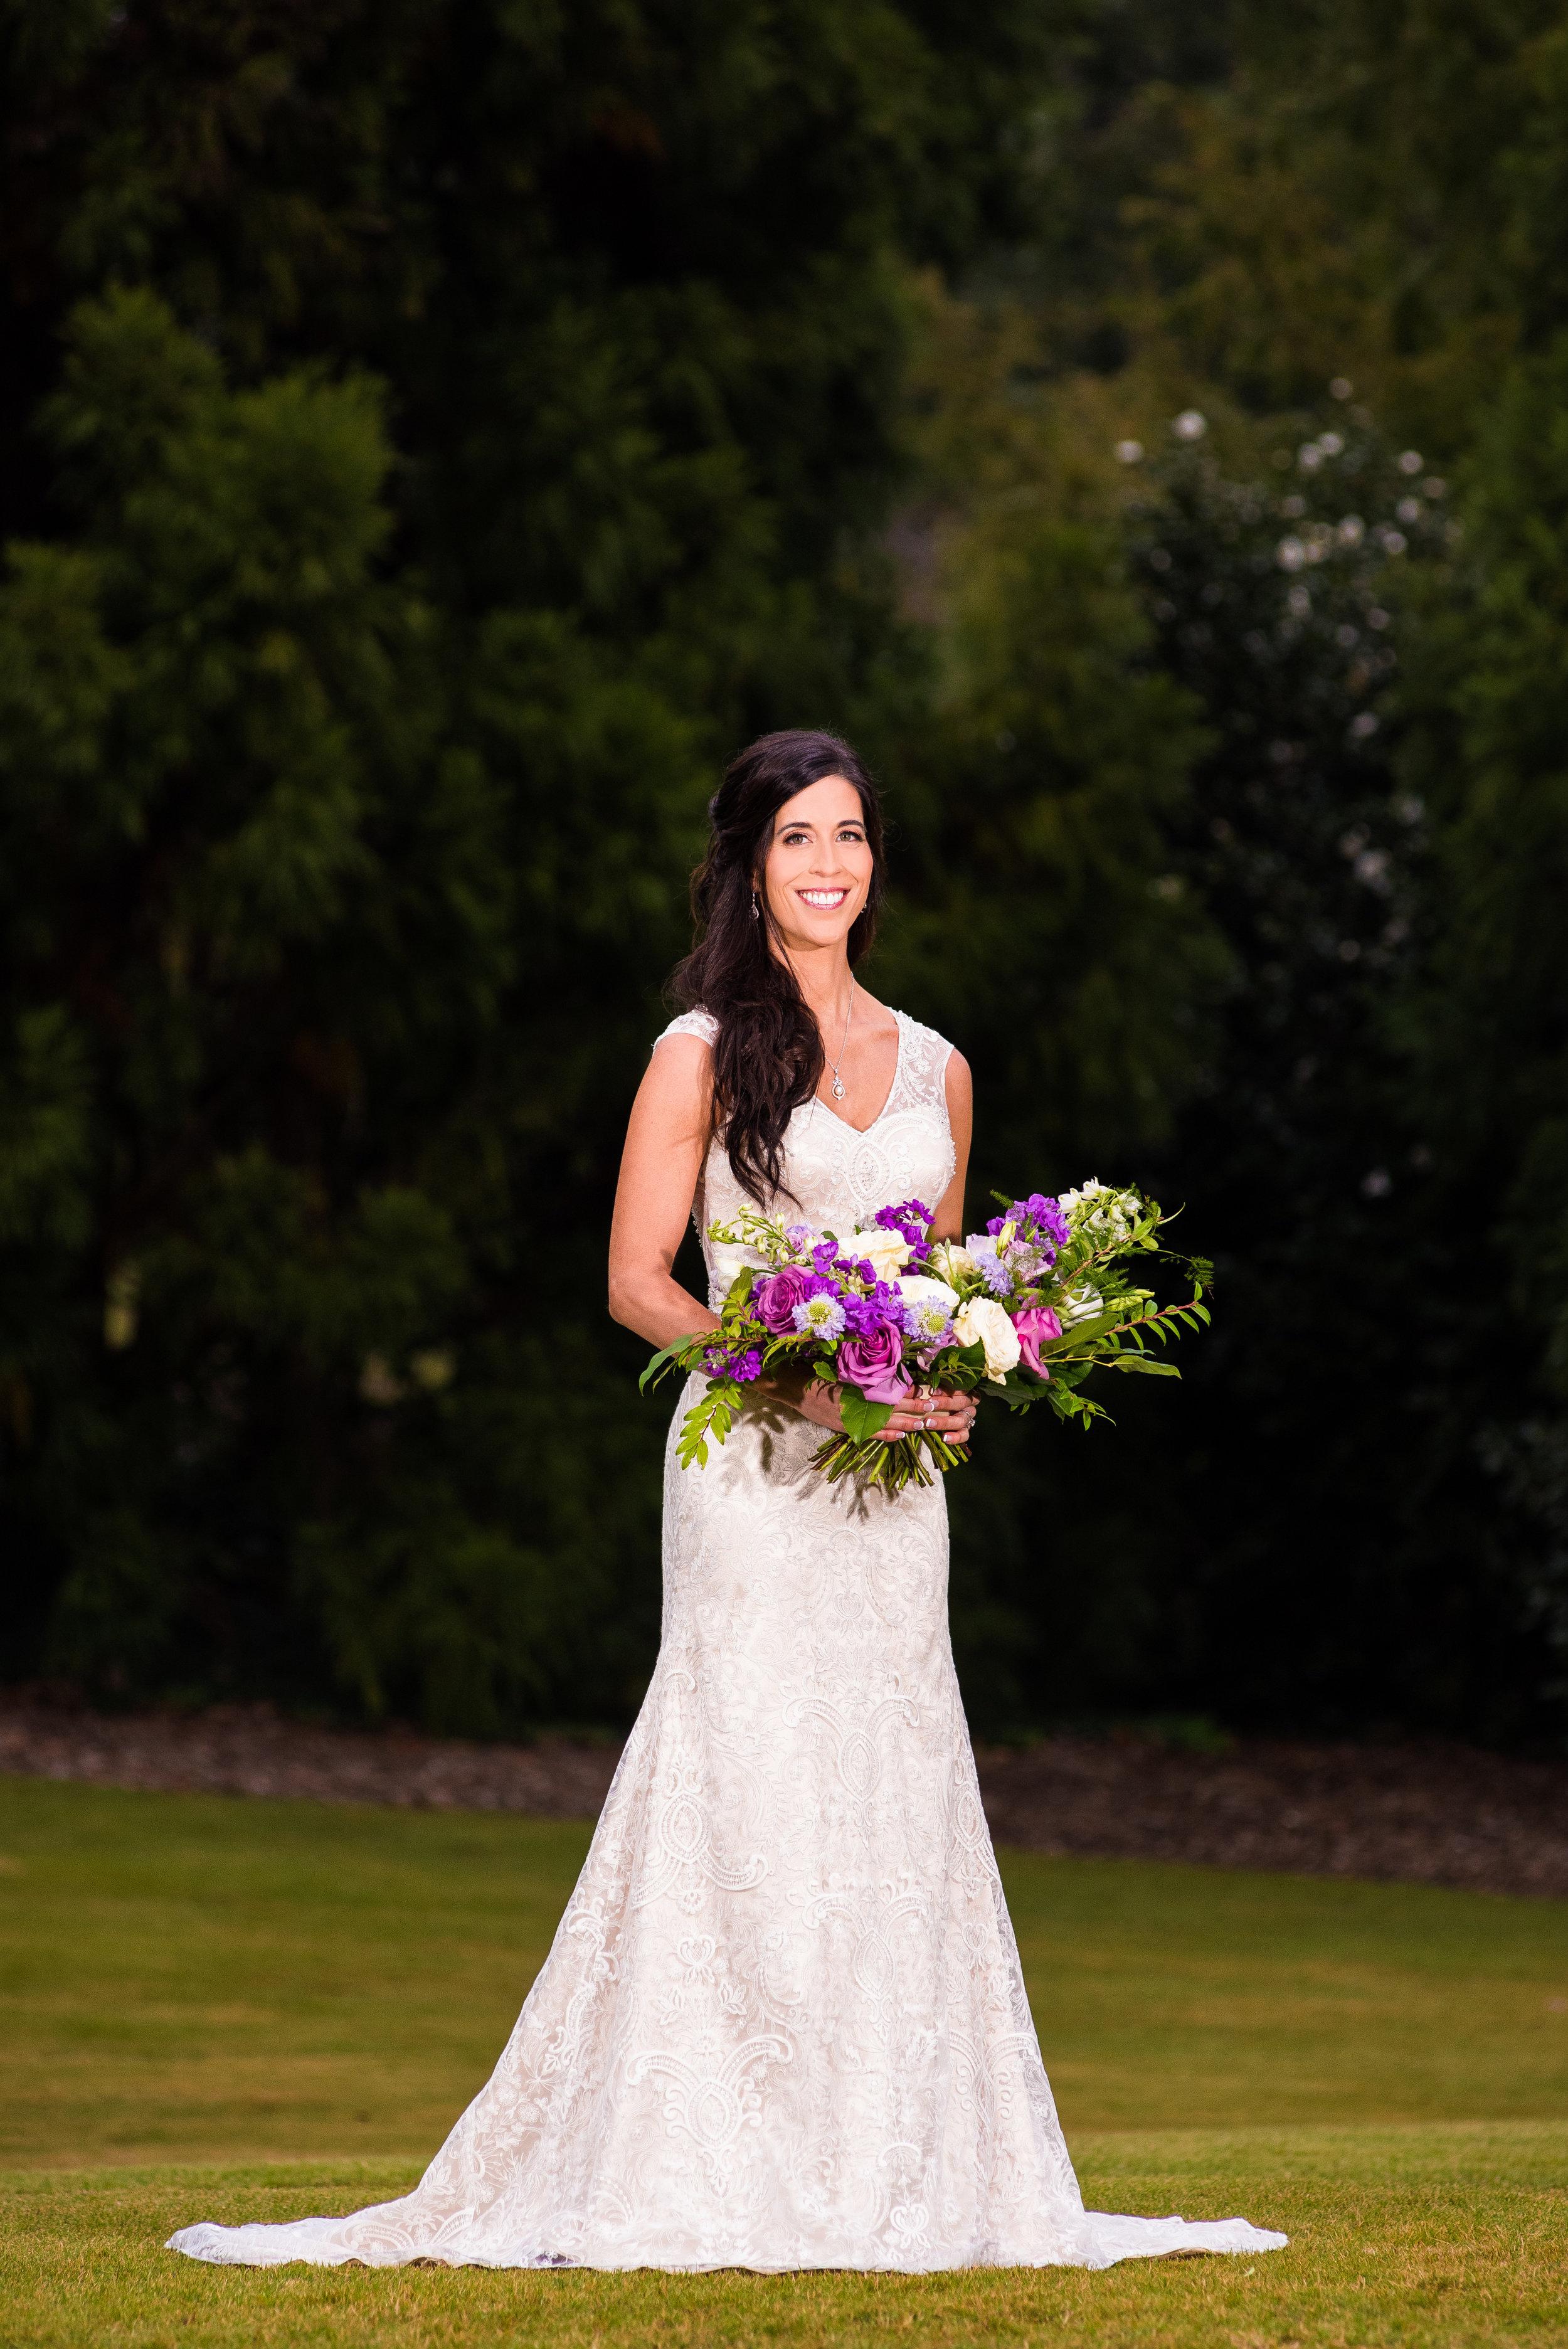 Heather & Lincoln Groves Wedding SP WEB_26.jpg